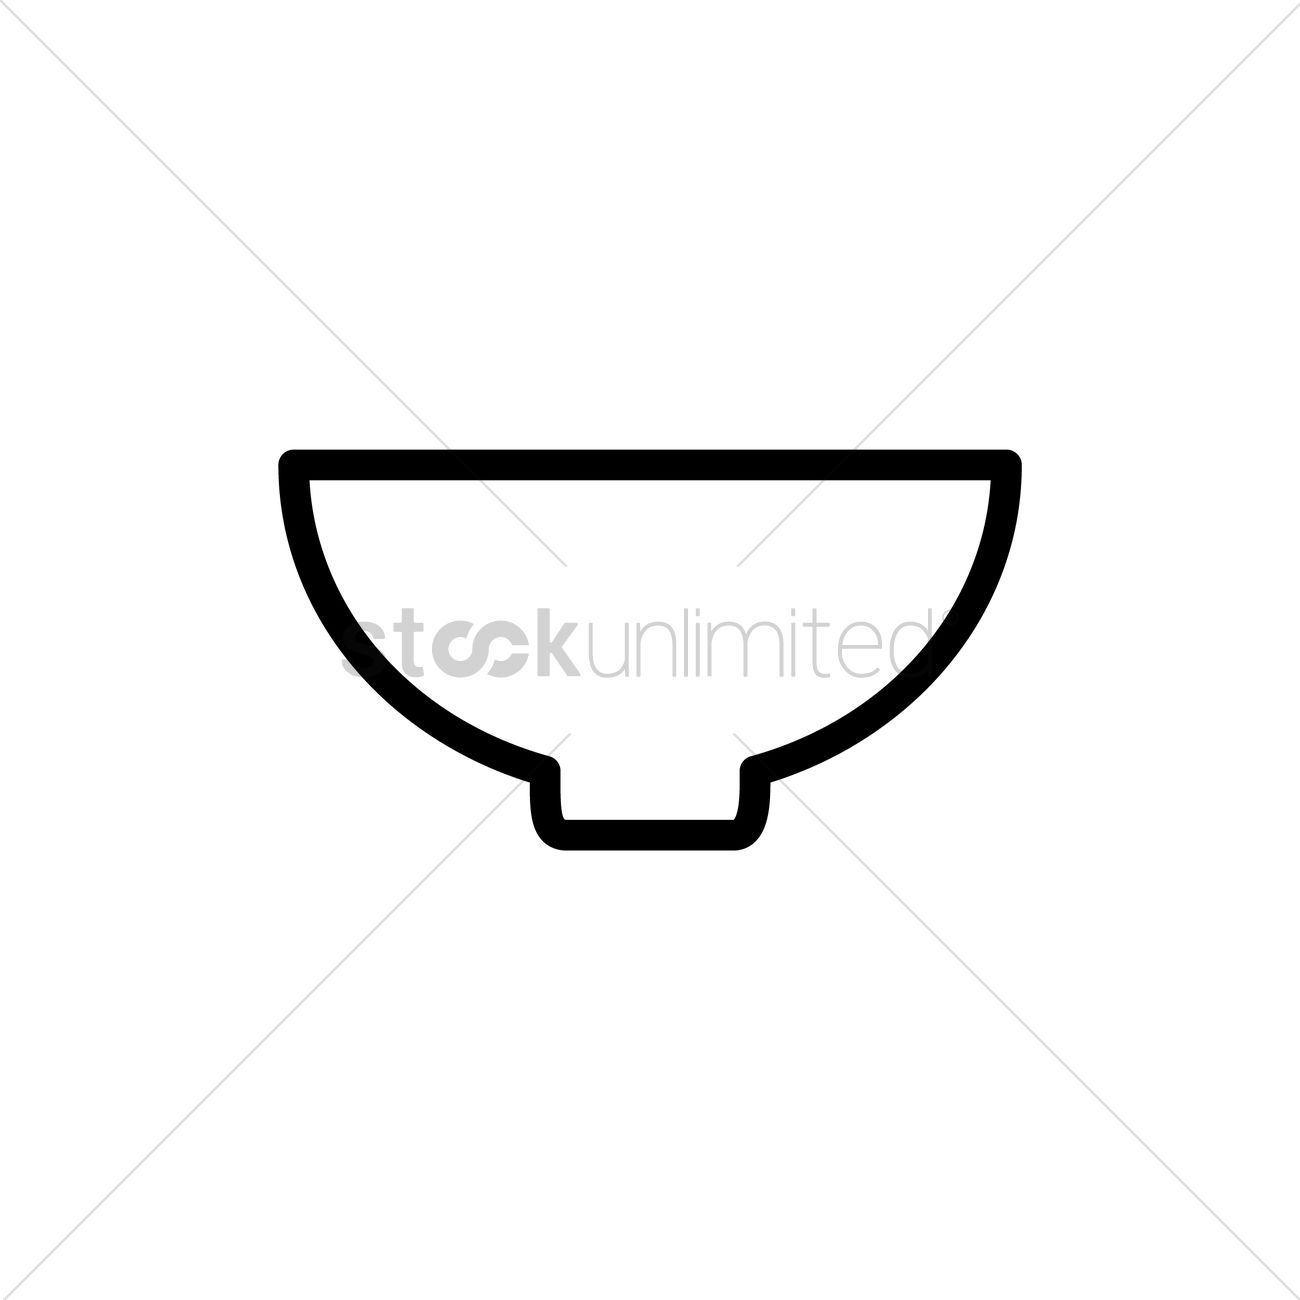 Bowl Vectors Stock Clipart Aff Vectors Bowl Clipart Stock Affiliate Lettering Symbols Background